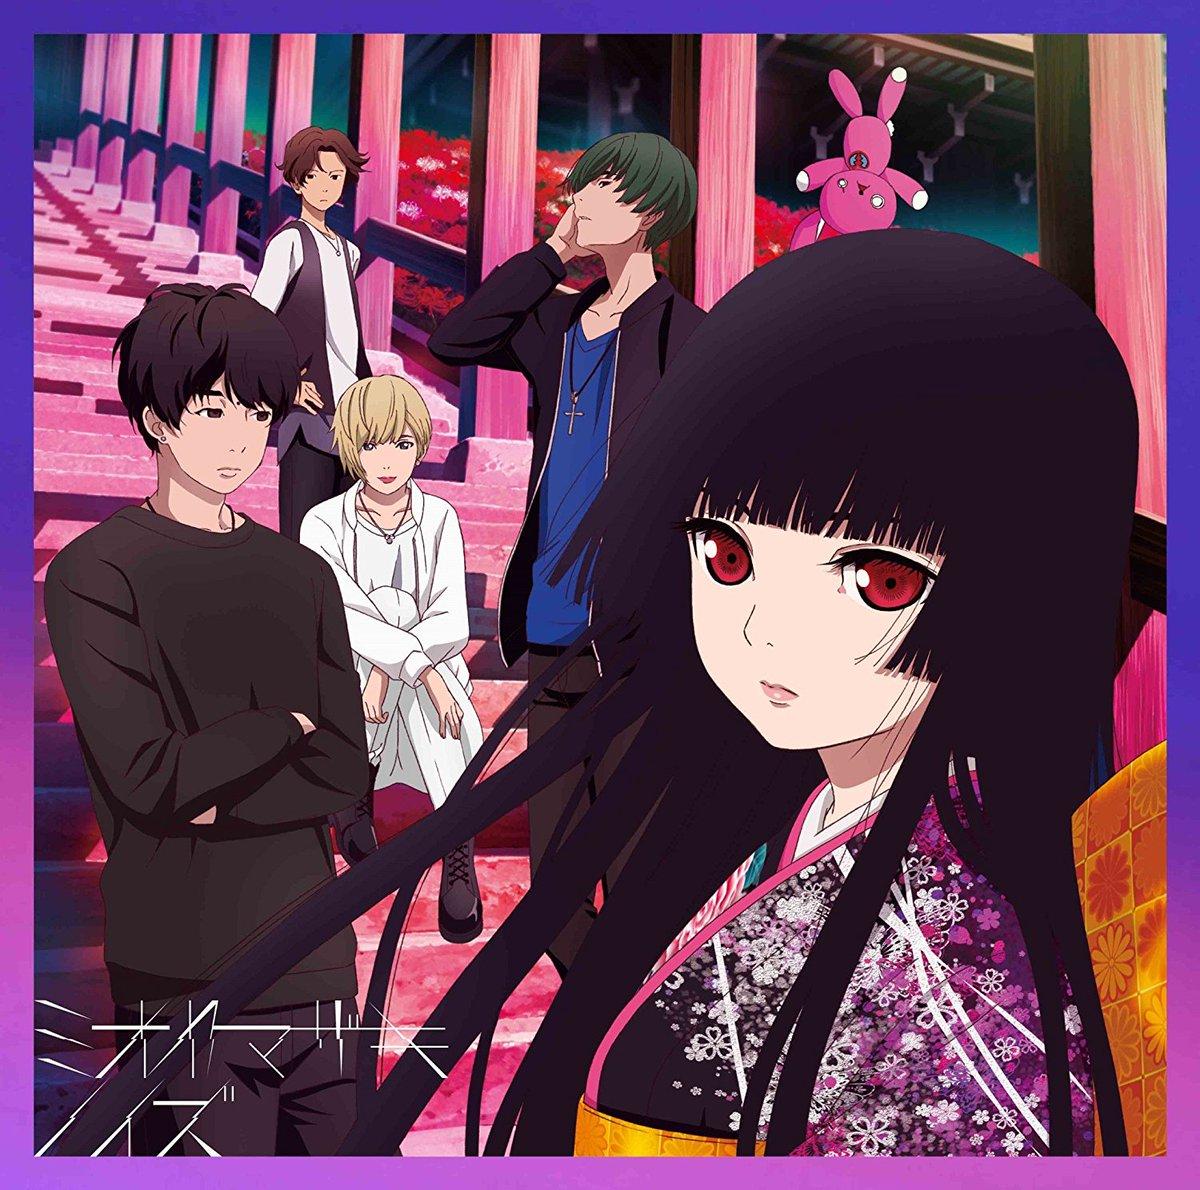 animes de terror top 10  Jigoku Shoujo Yoi no Togi